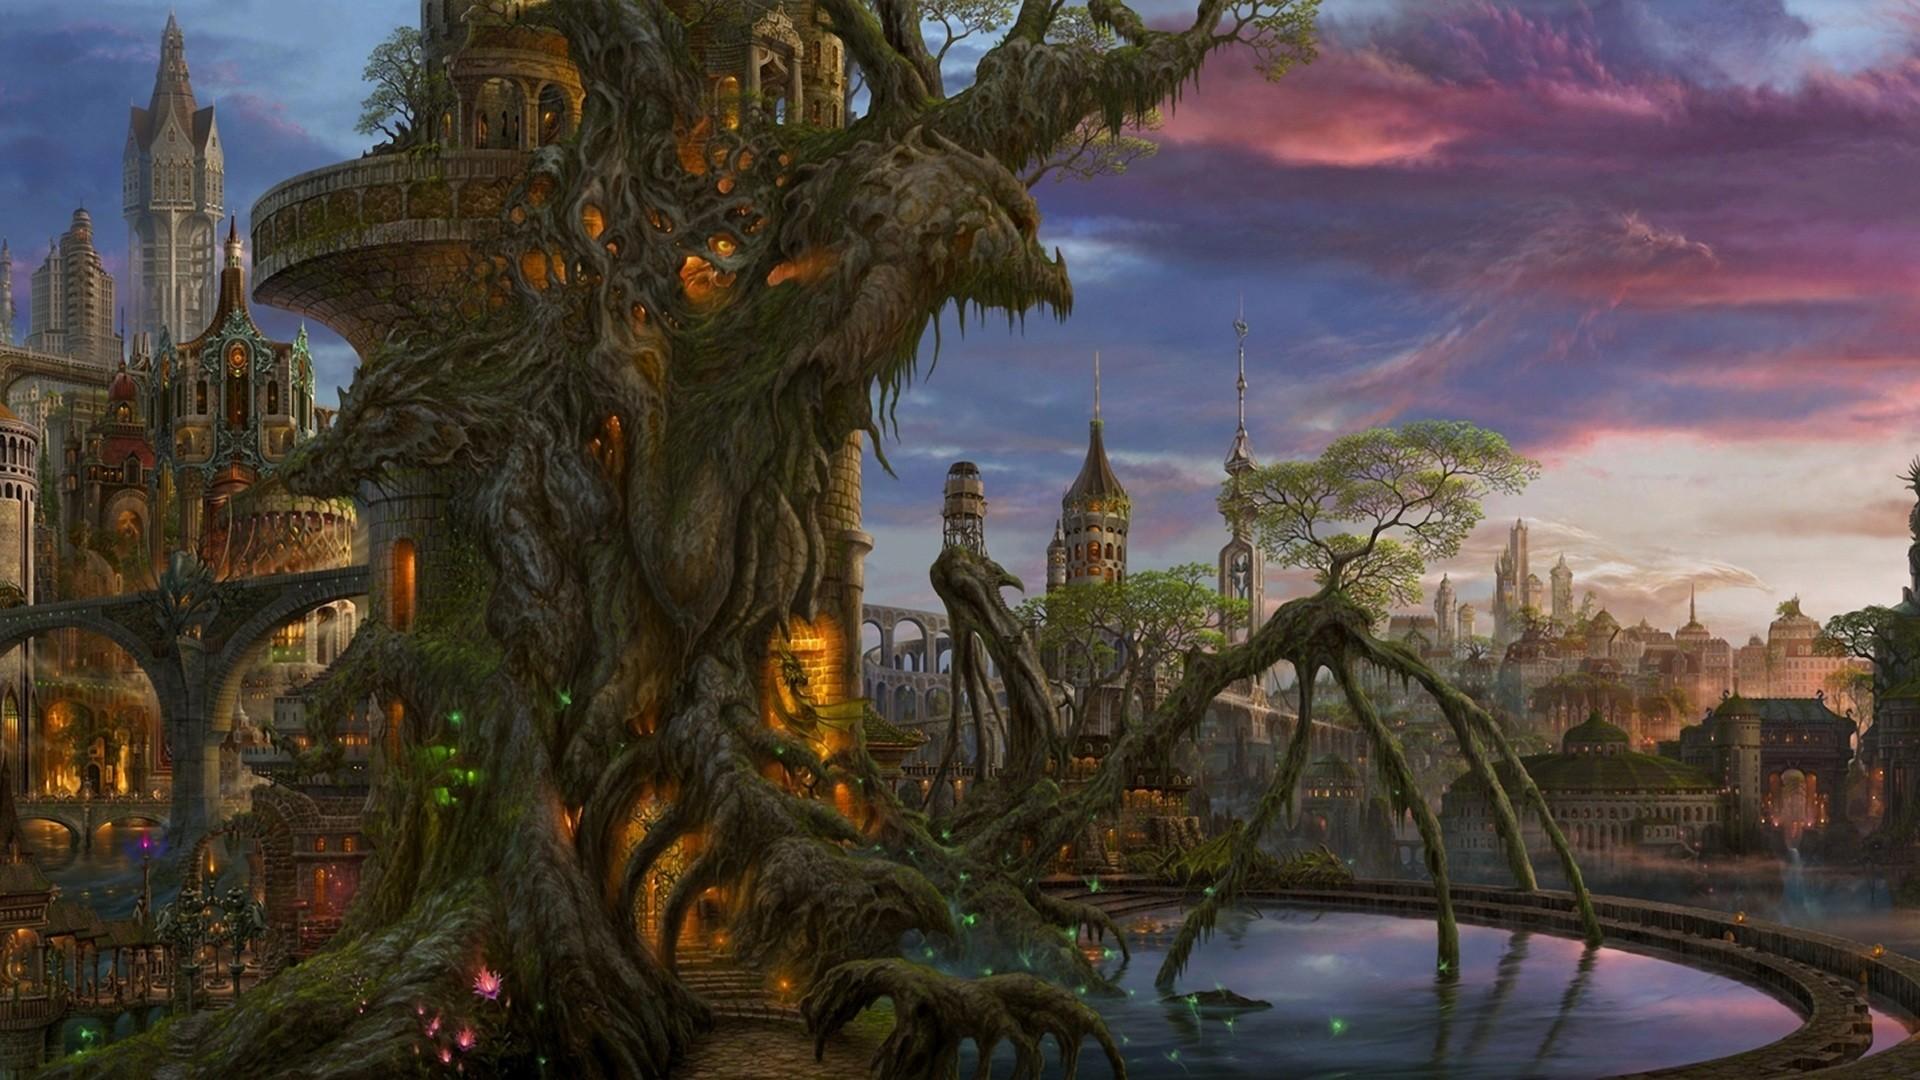 Fantasy – City Building Castle Artistic Wallpaper